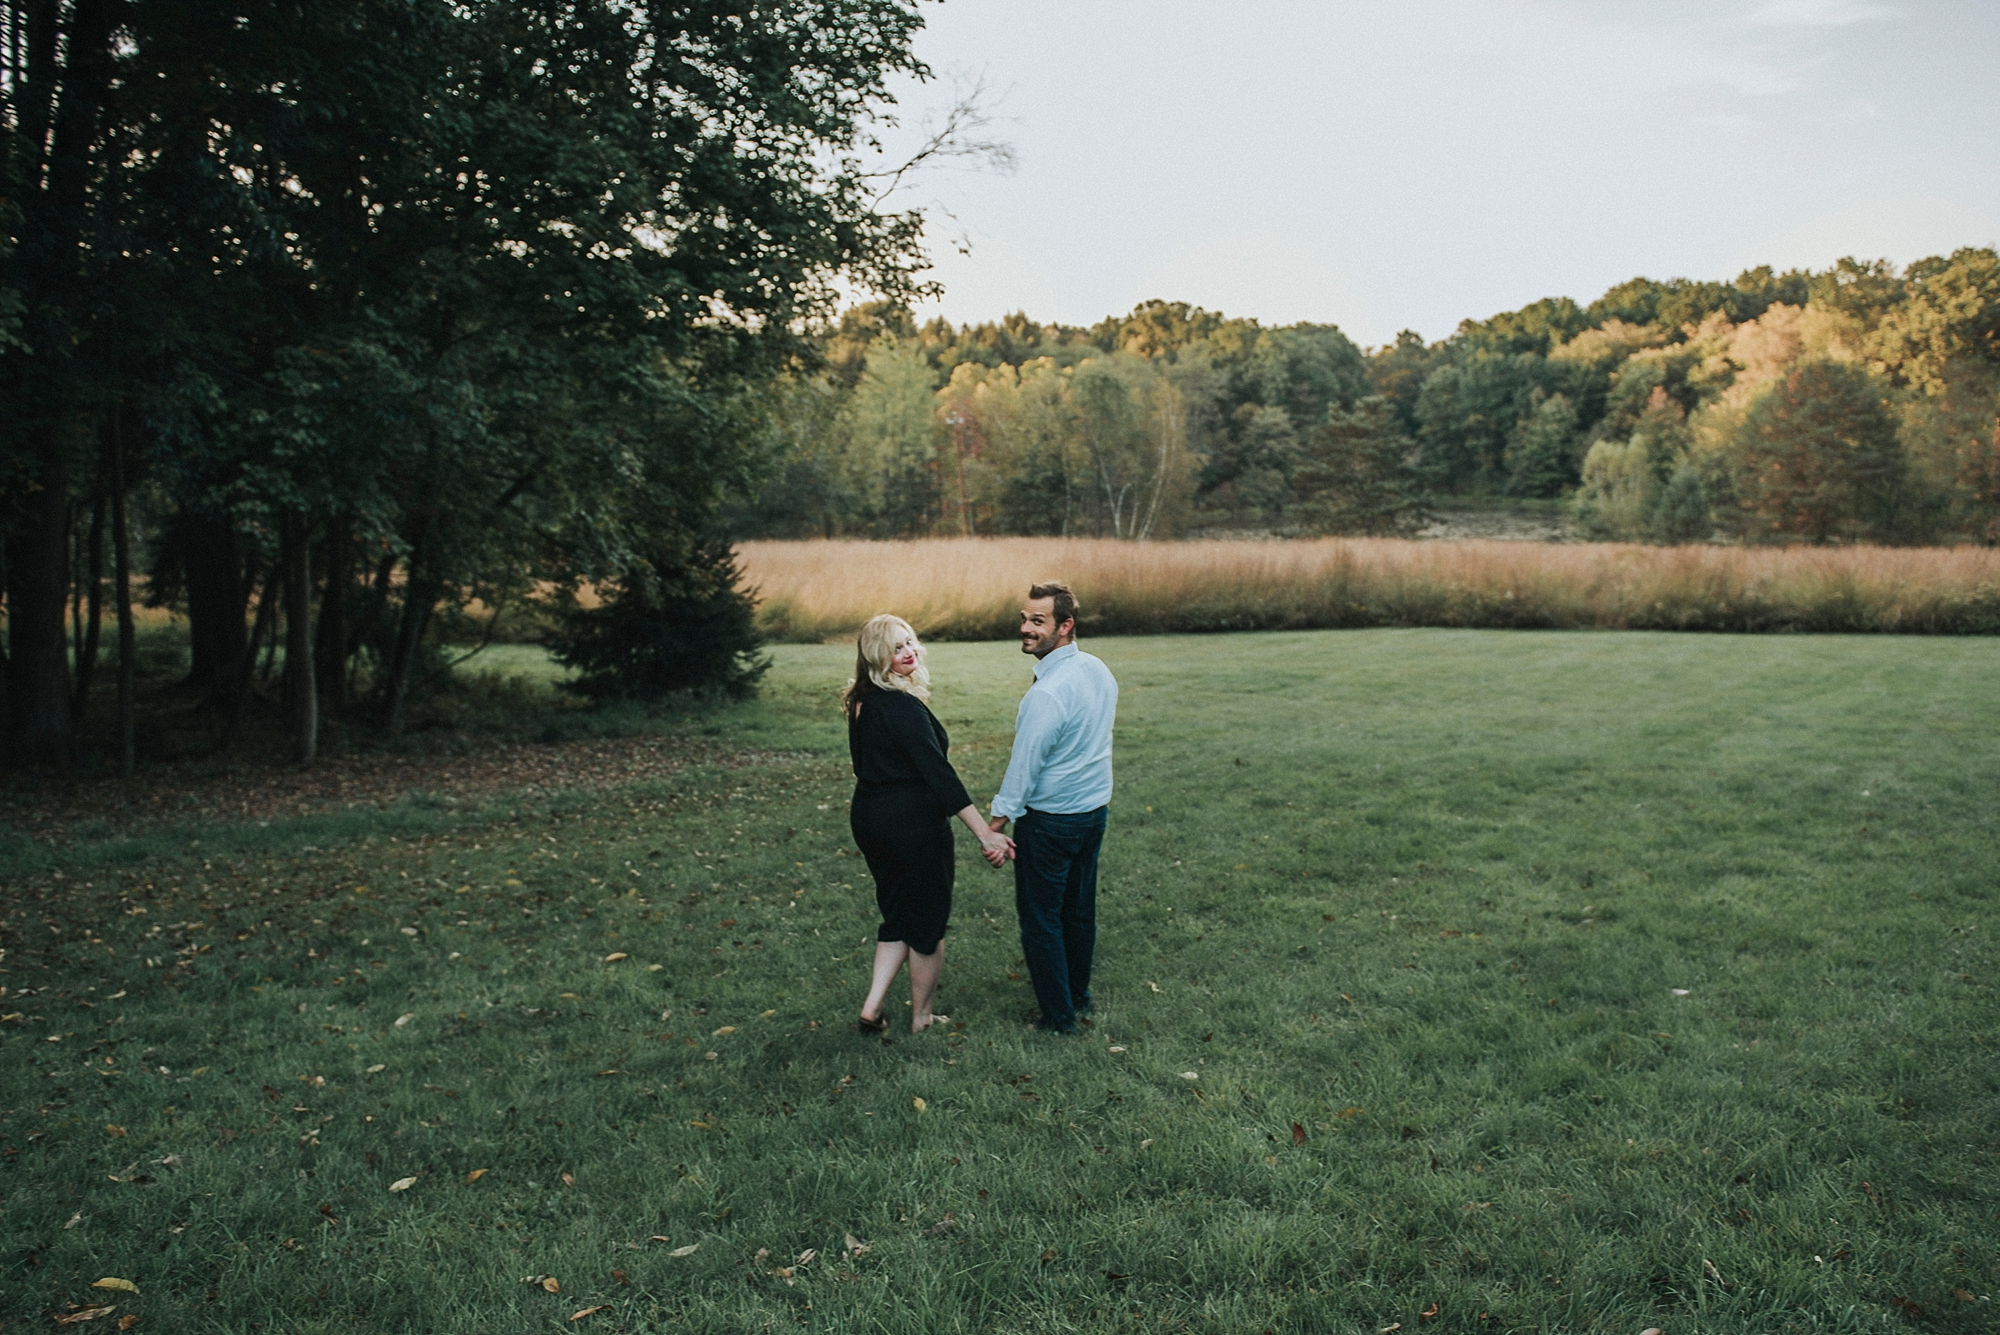 Engagement session vsco - couple